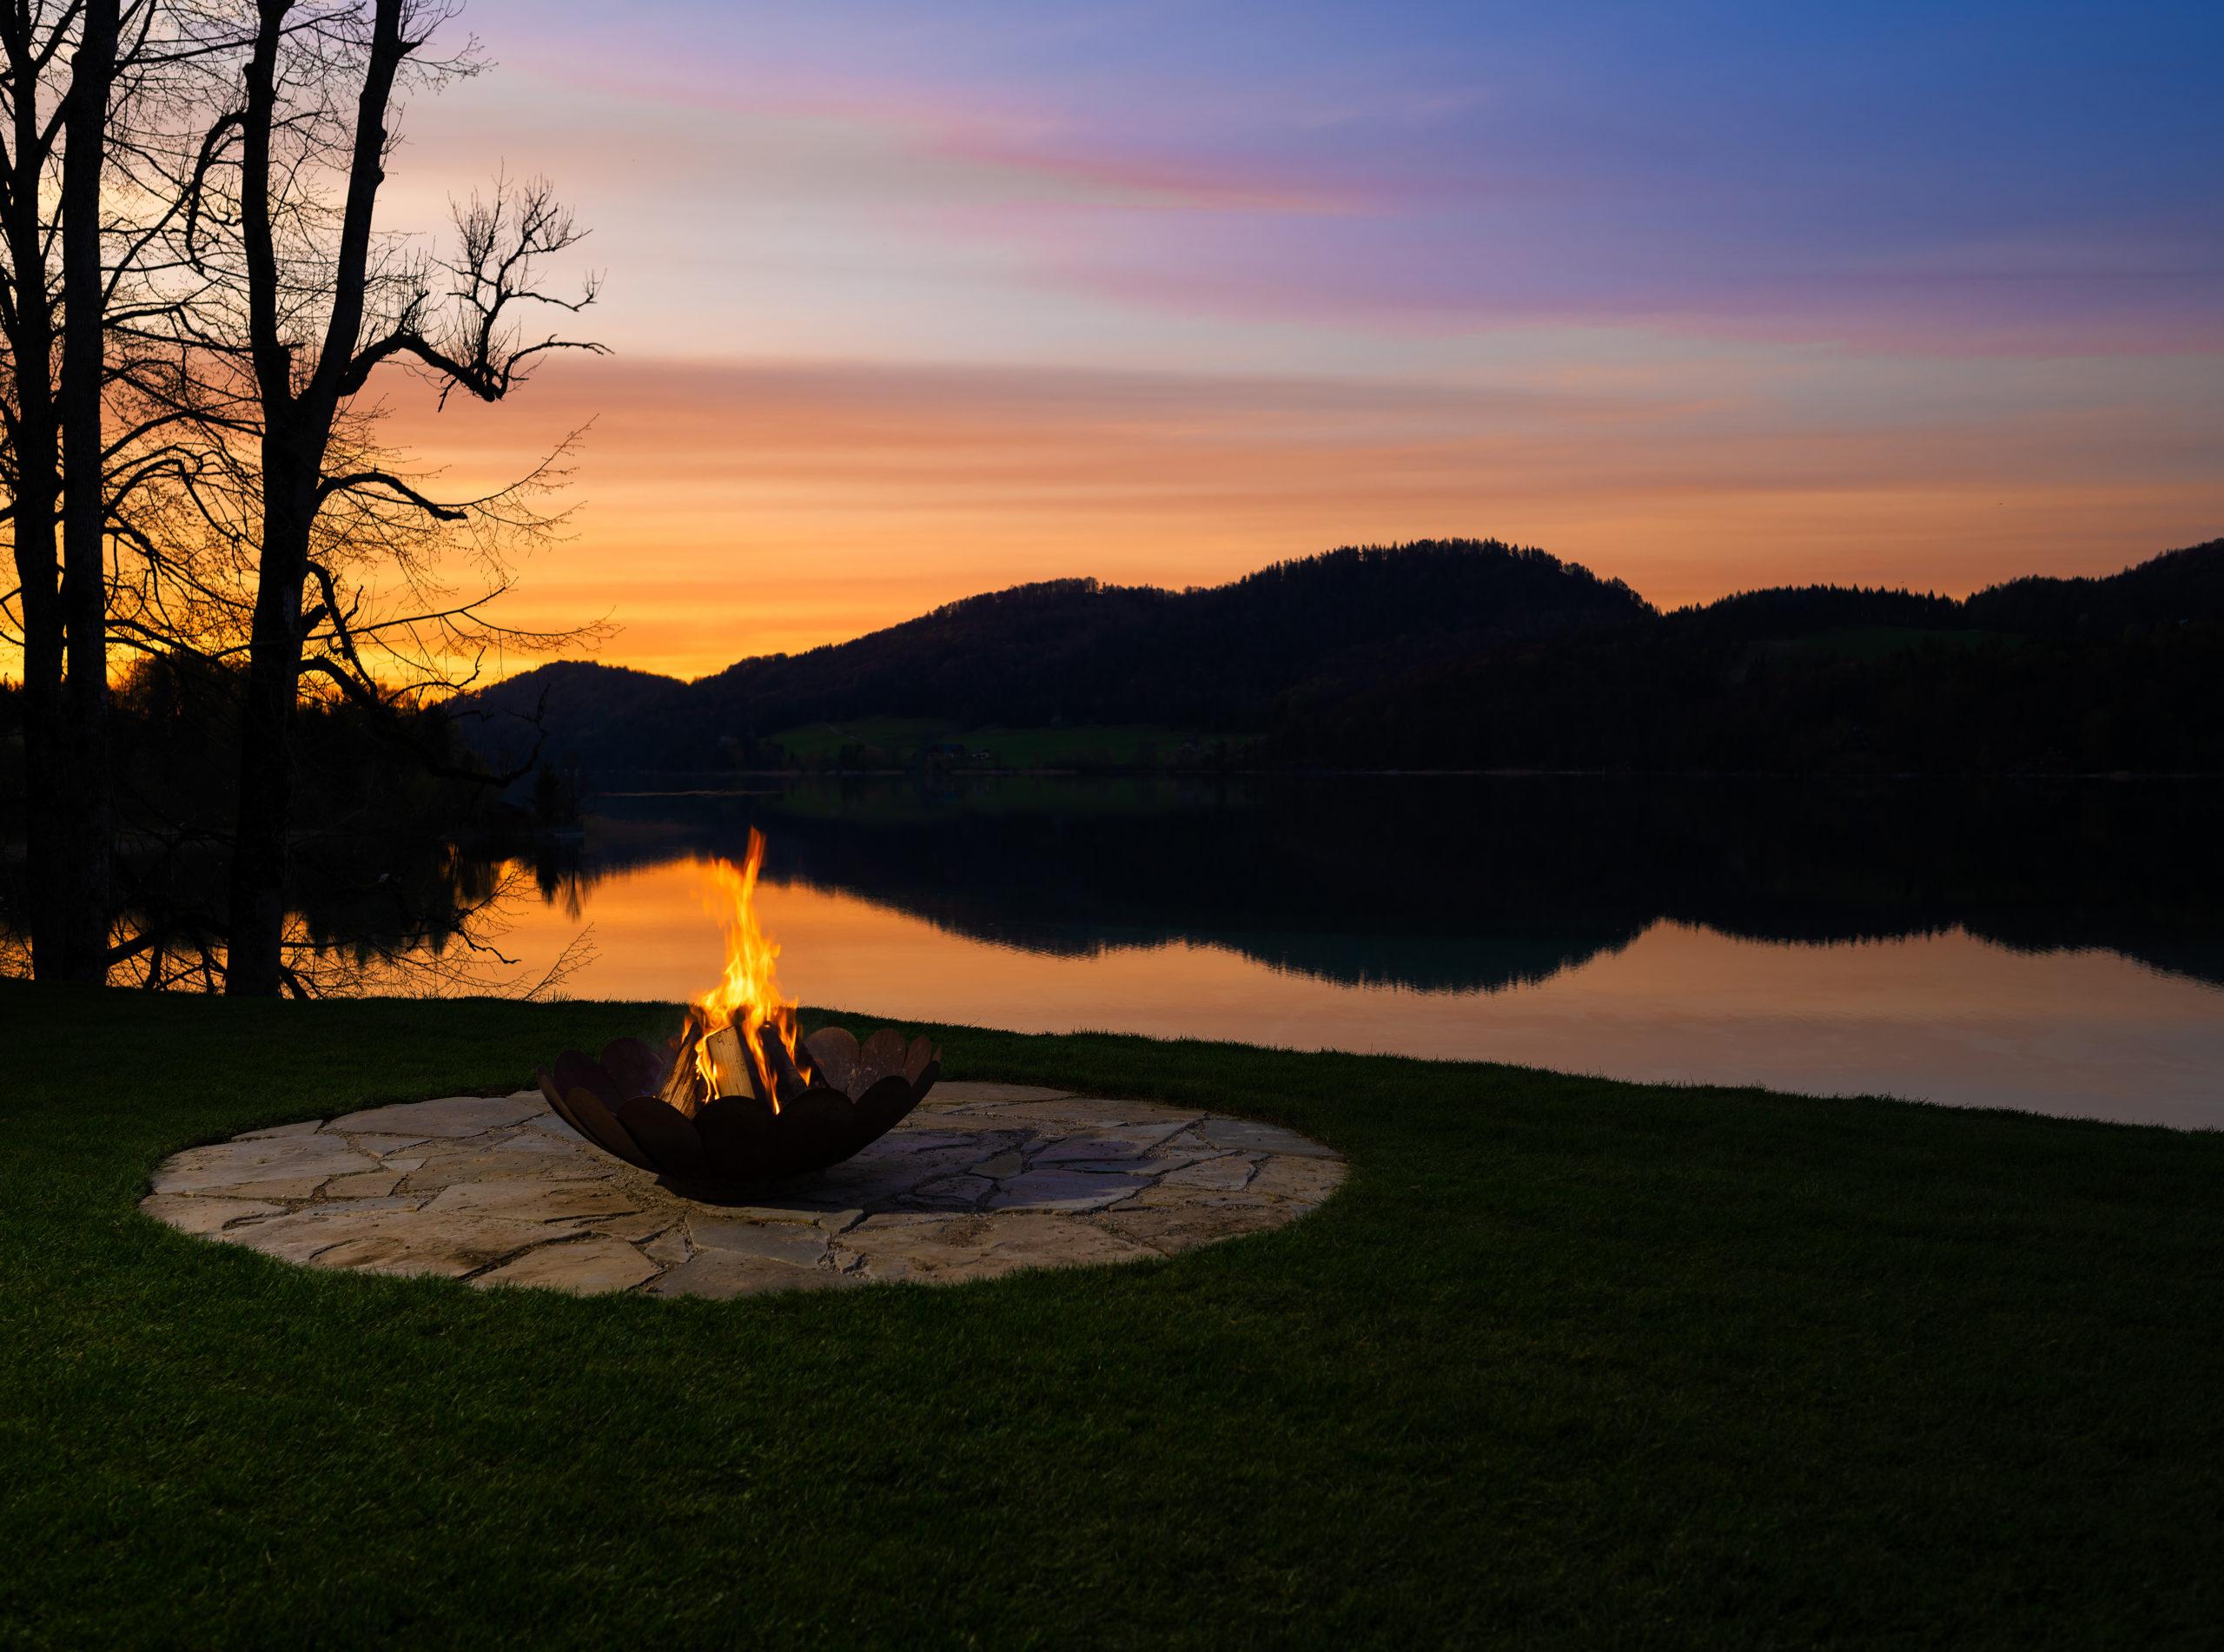 Sonnenuntergang Fuschlsee © pixelkinder.com